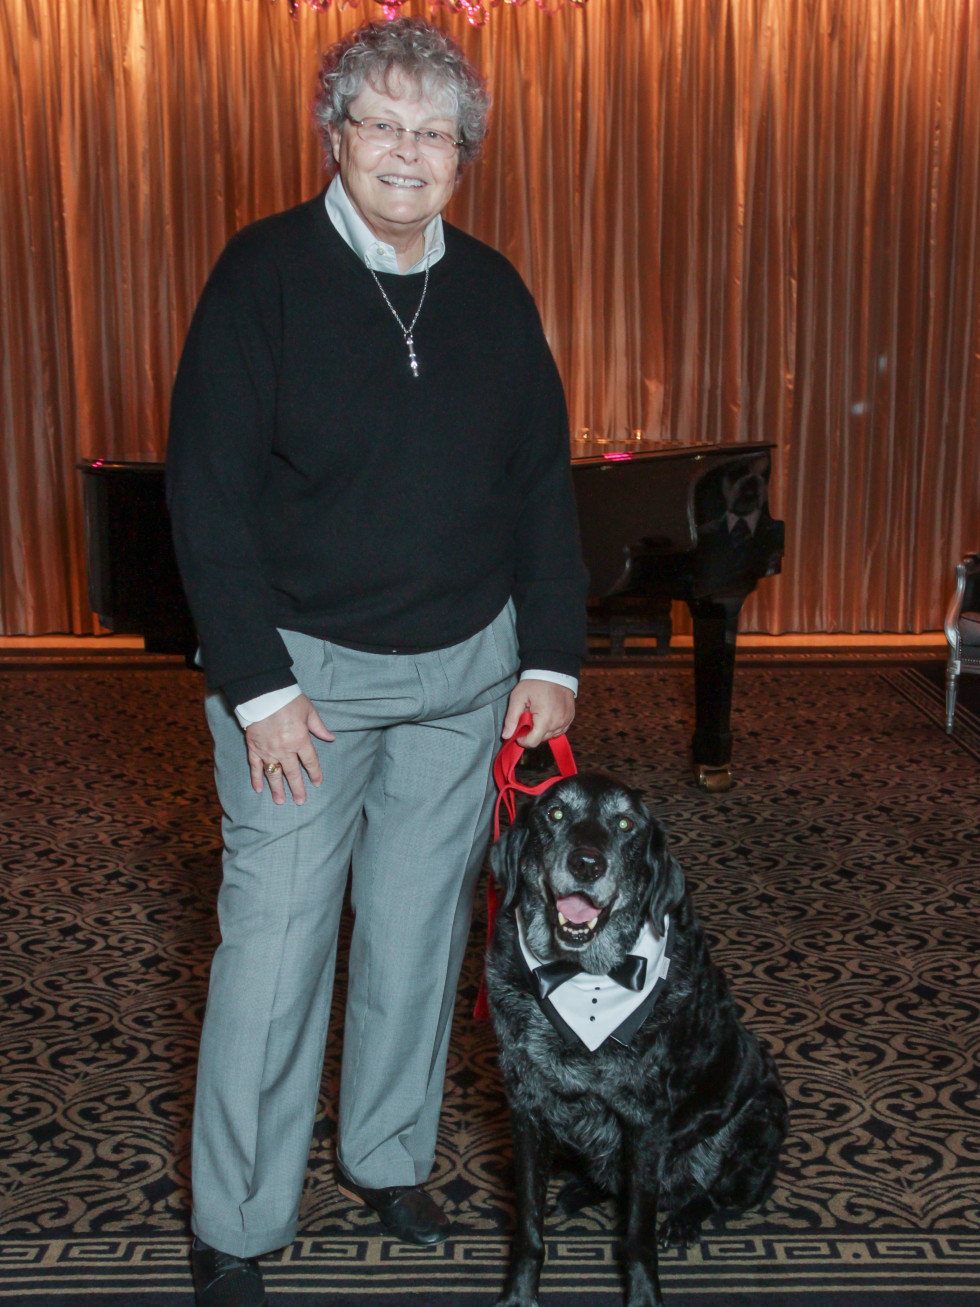 Doggie fashion show winner Pat Wild and Willie at Interfaith Ministries brunch